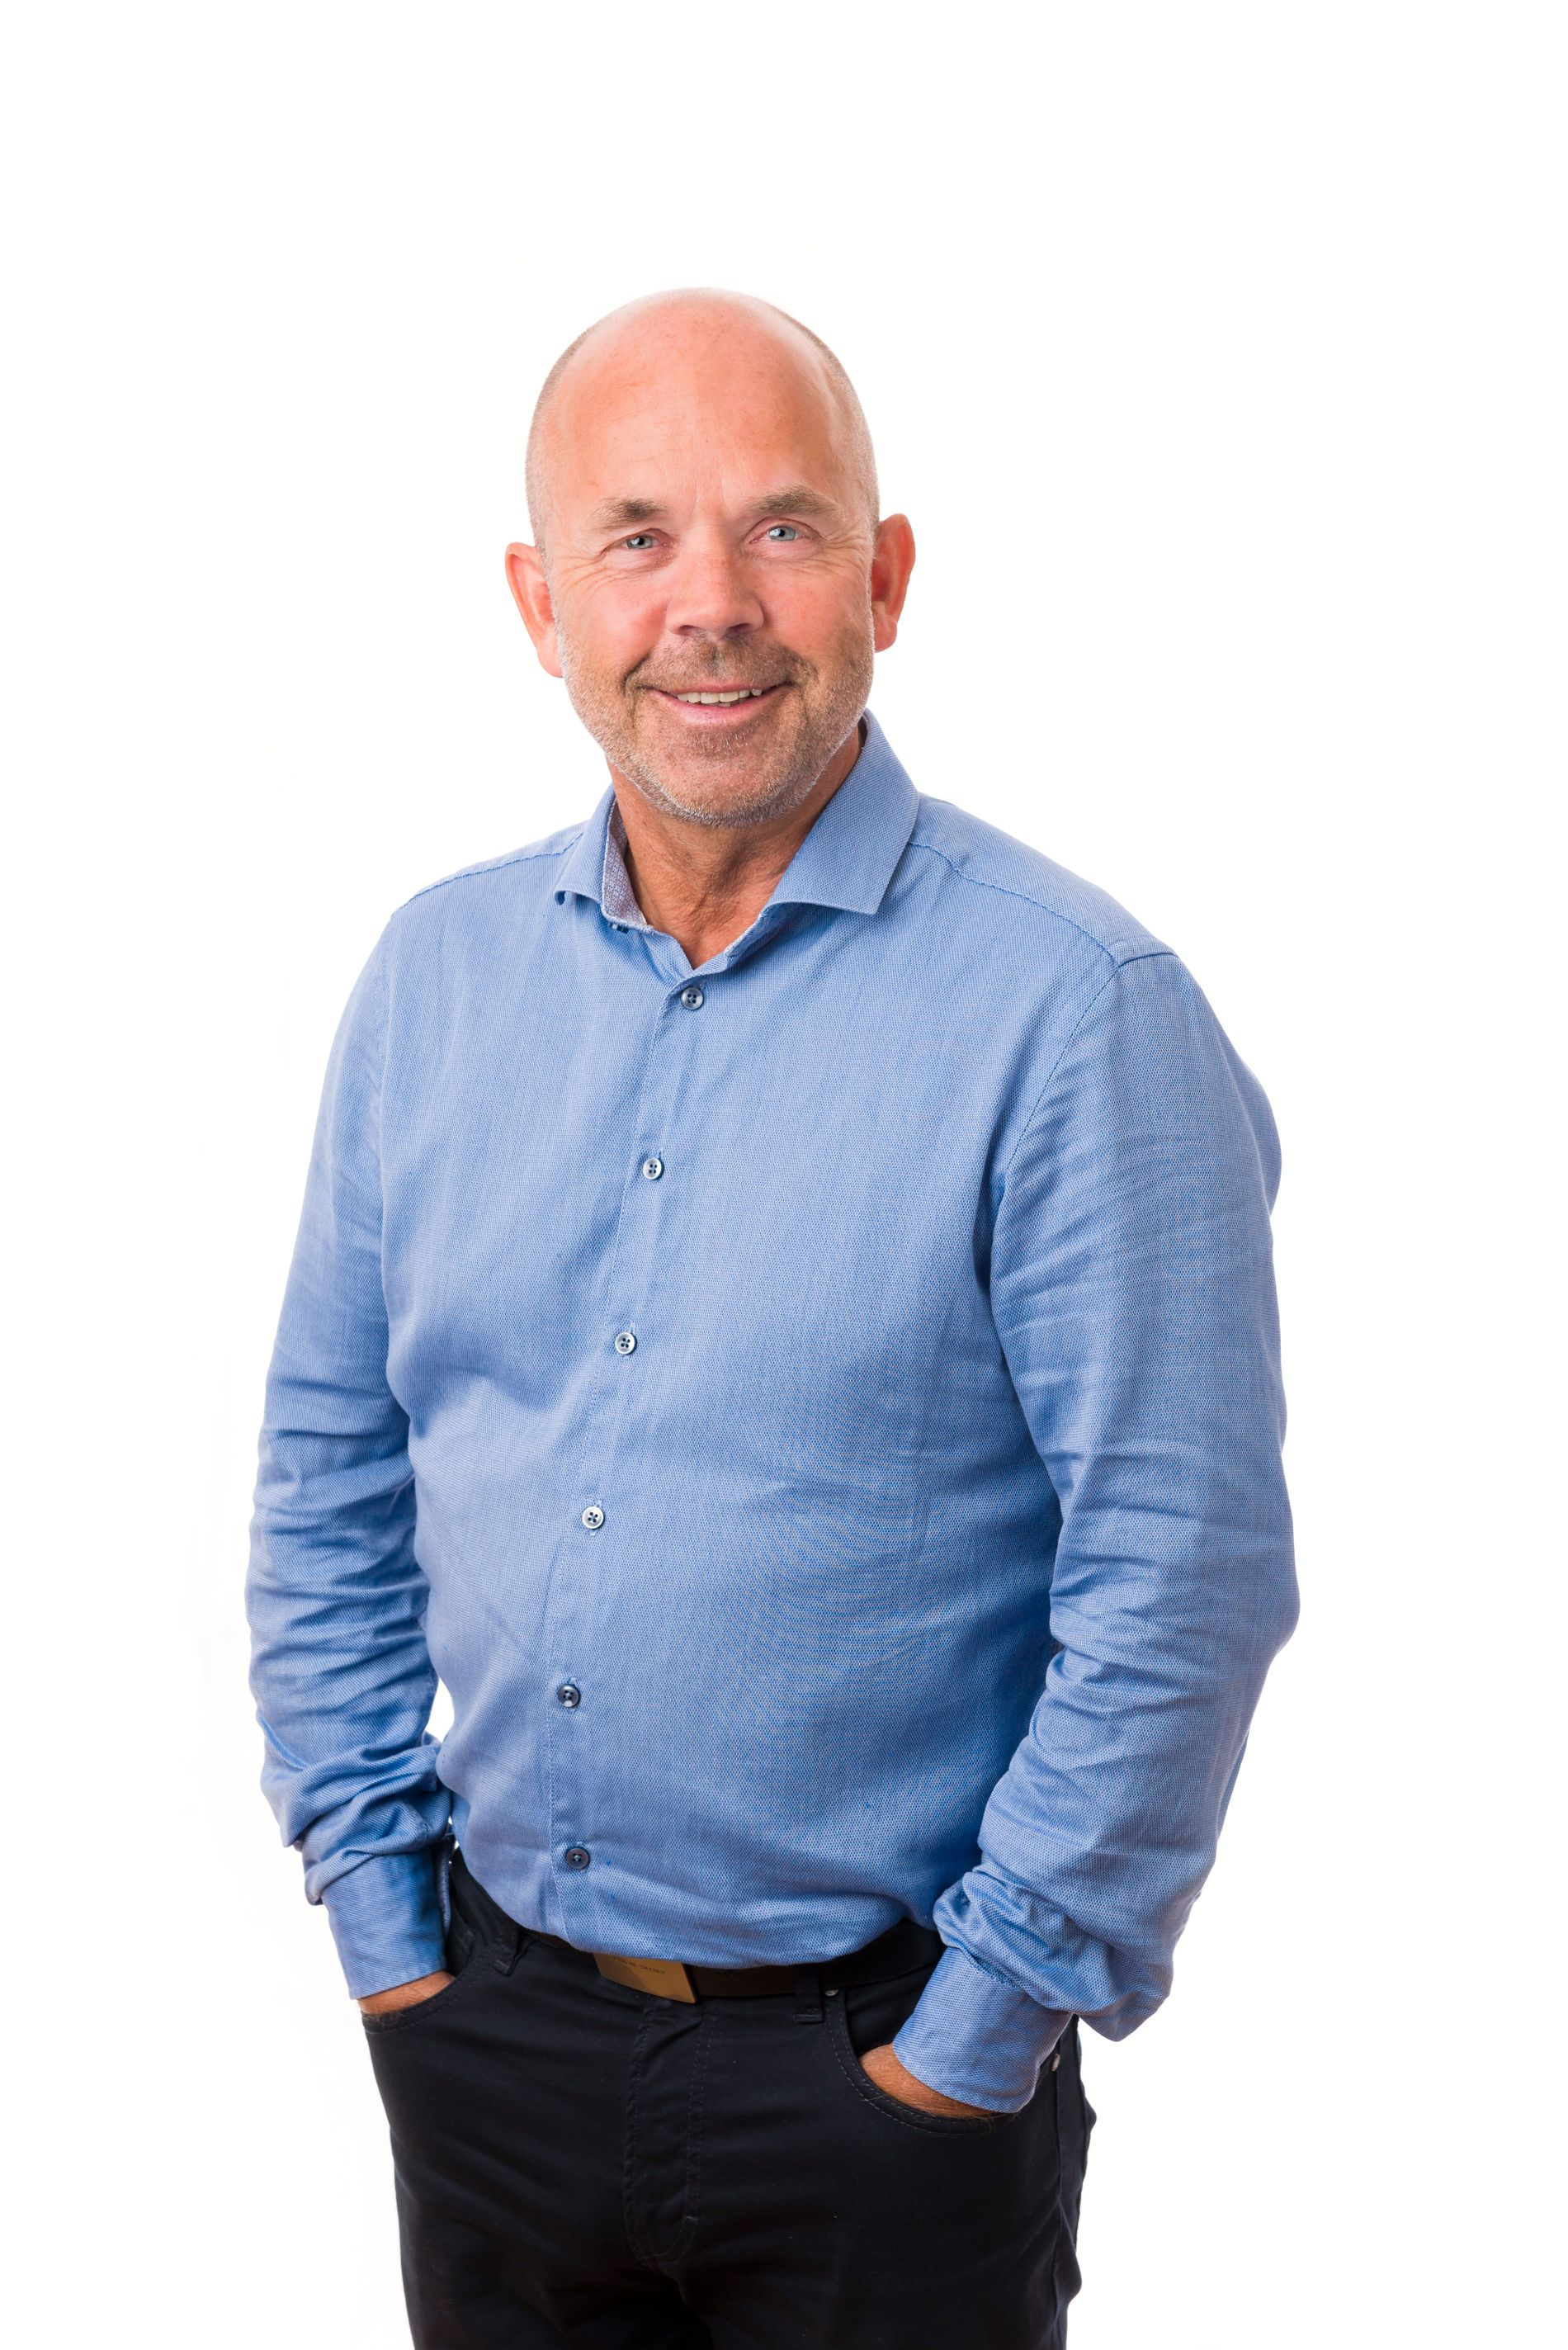 Frode Halvorsen, Regional Bank Manager of Sparebanken Sør in Skien.